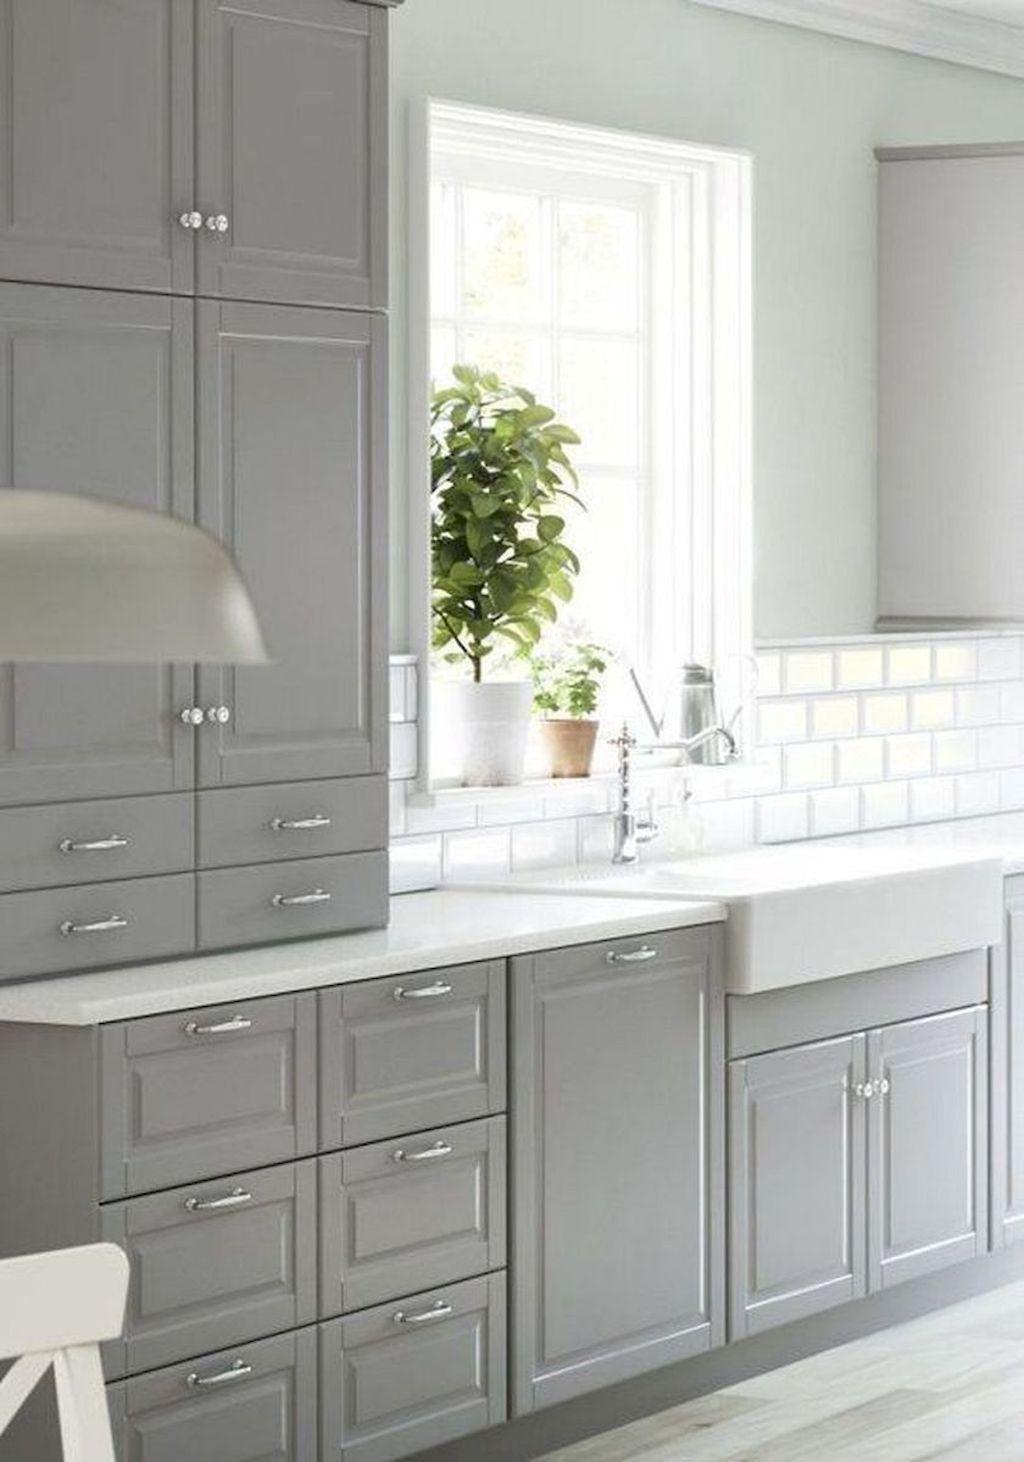 10 Incredible Farmhouse Gray Kitchen Cabinet Design Ideas